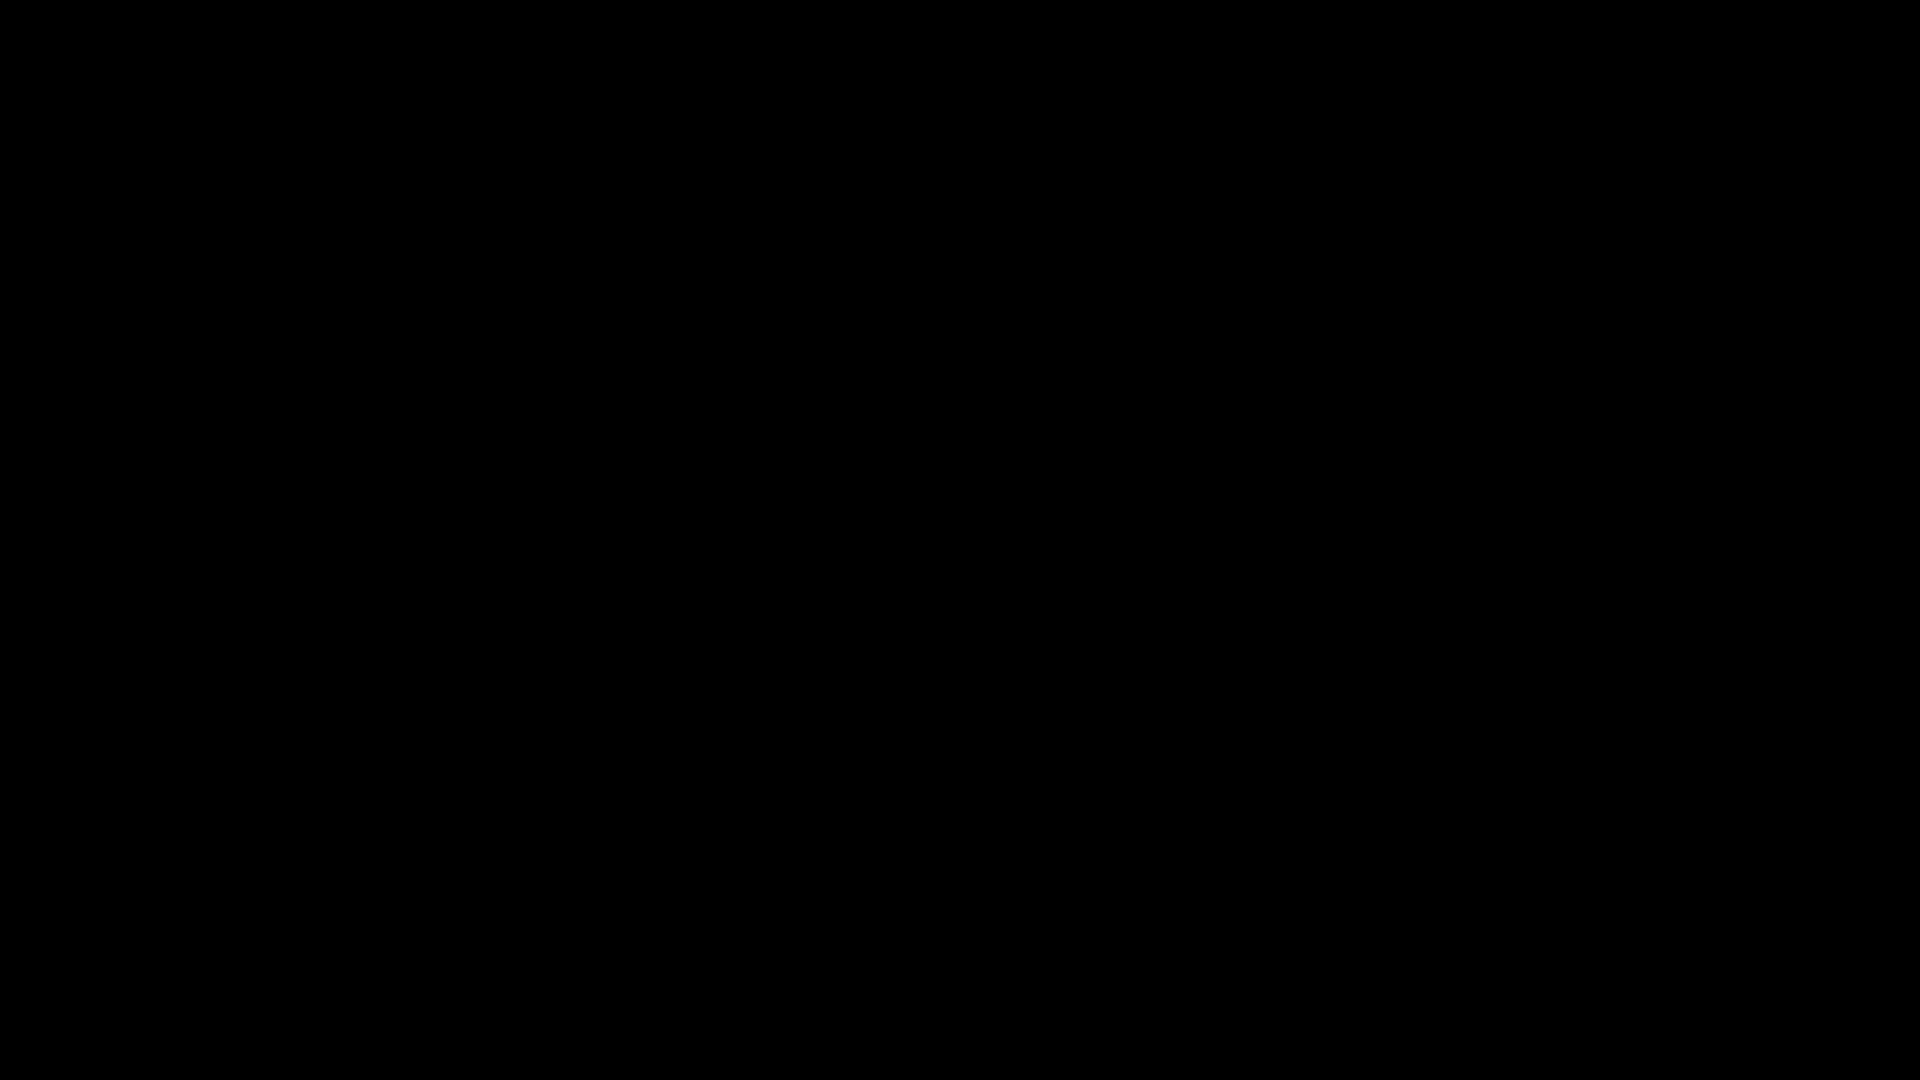 FRANCOIS THUILLIER - ELEPHANT TUBA HORDE